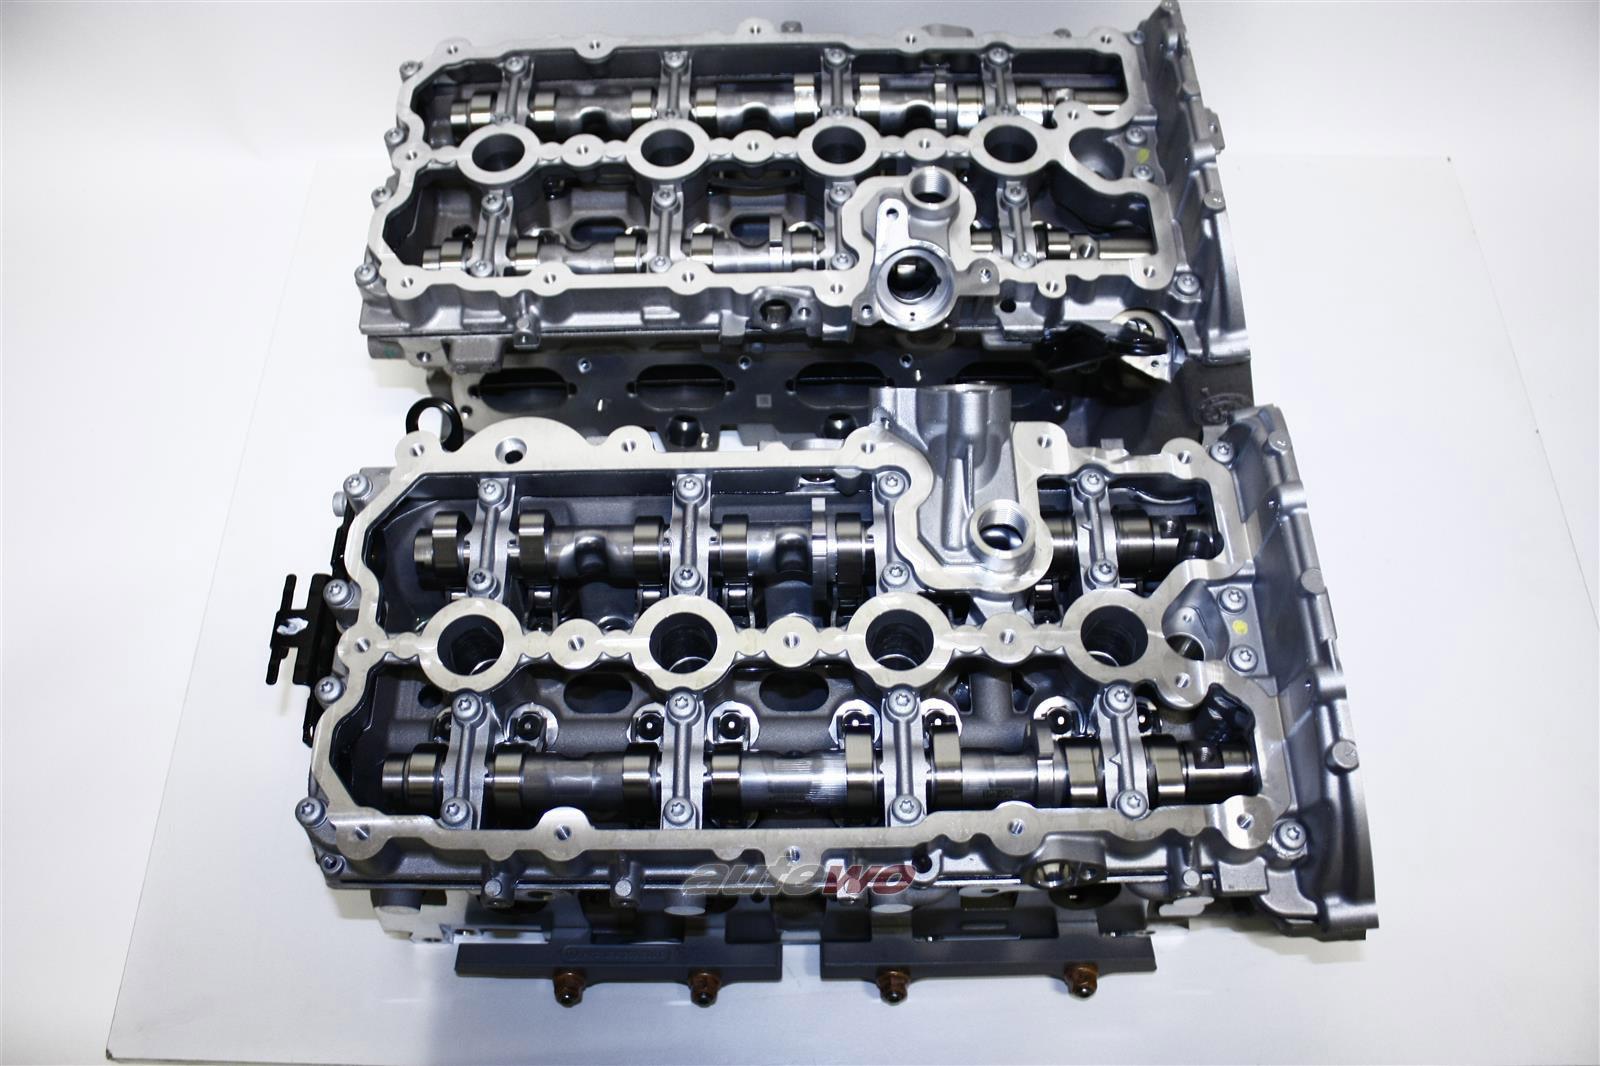 079103063/064/CA/CE/BN NEU Audi A6/S6/Allroad 4F/A8 D3 4.2l SET Zylinderköpfe